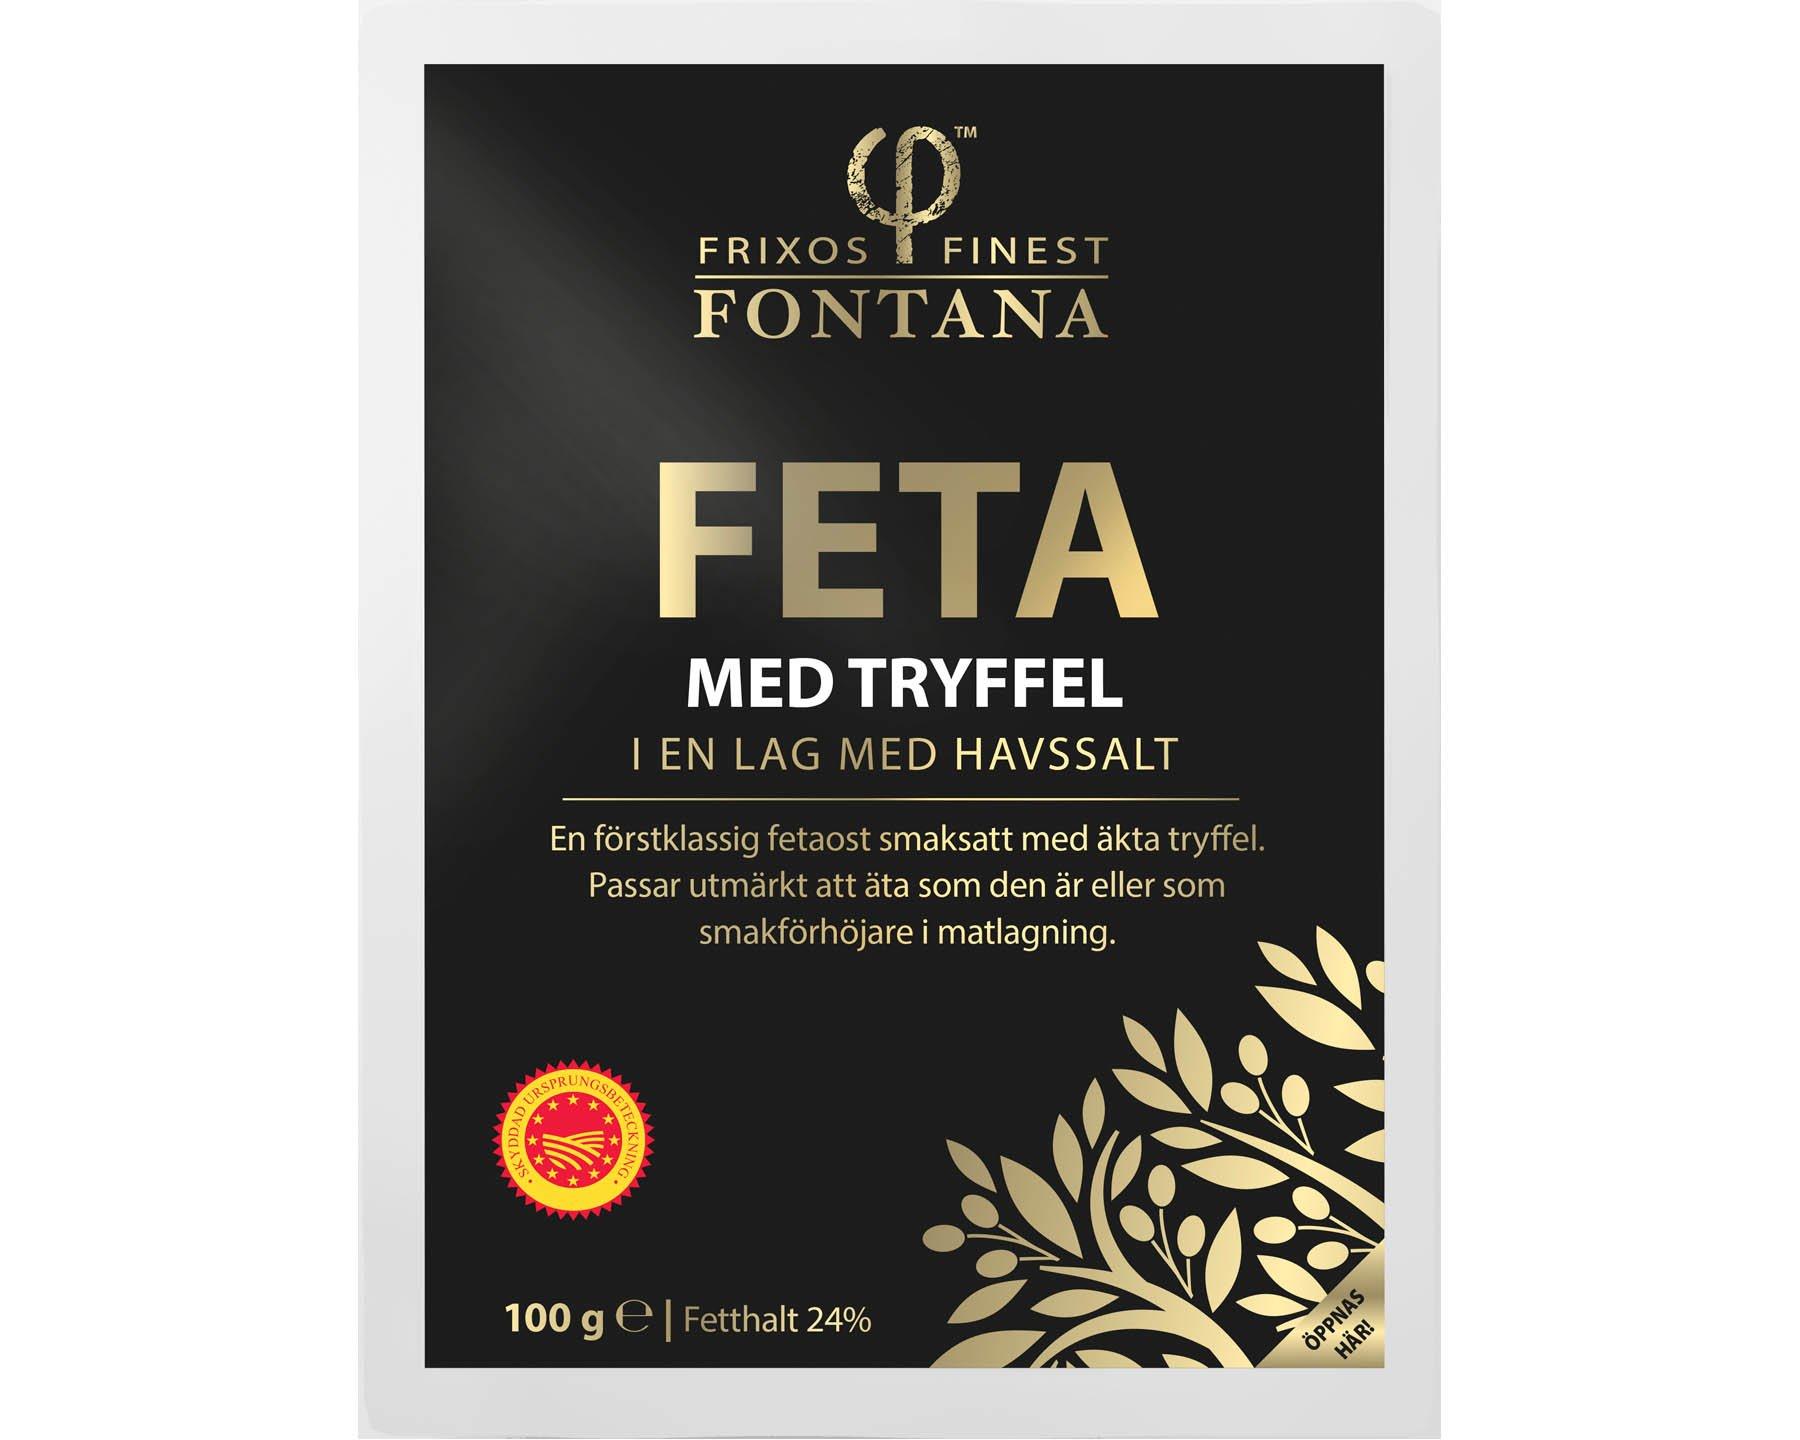 Fontana Frixos Finest Feta med Tryffel